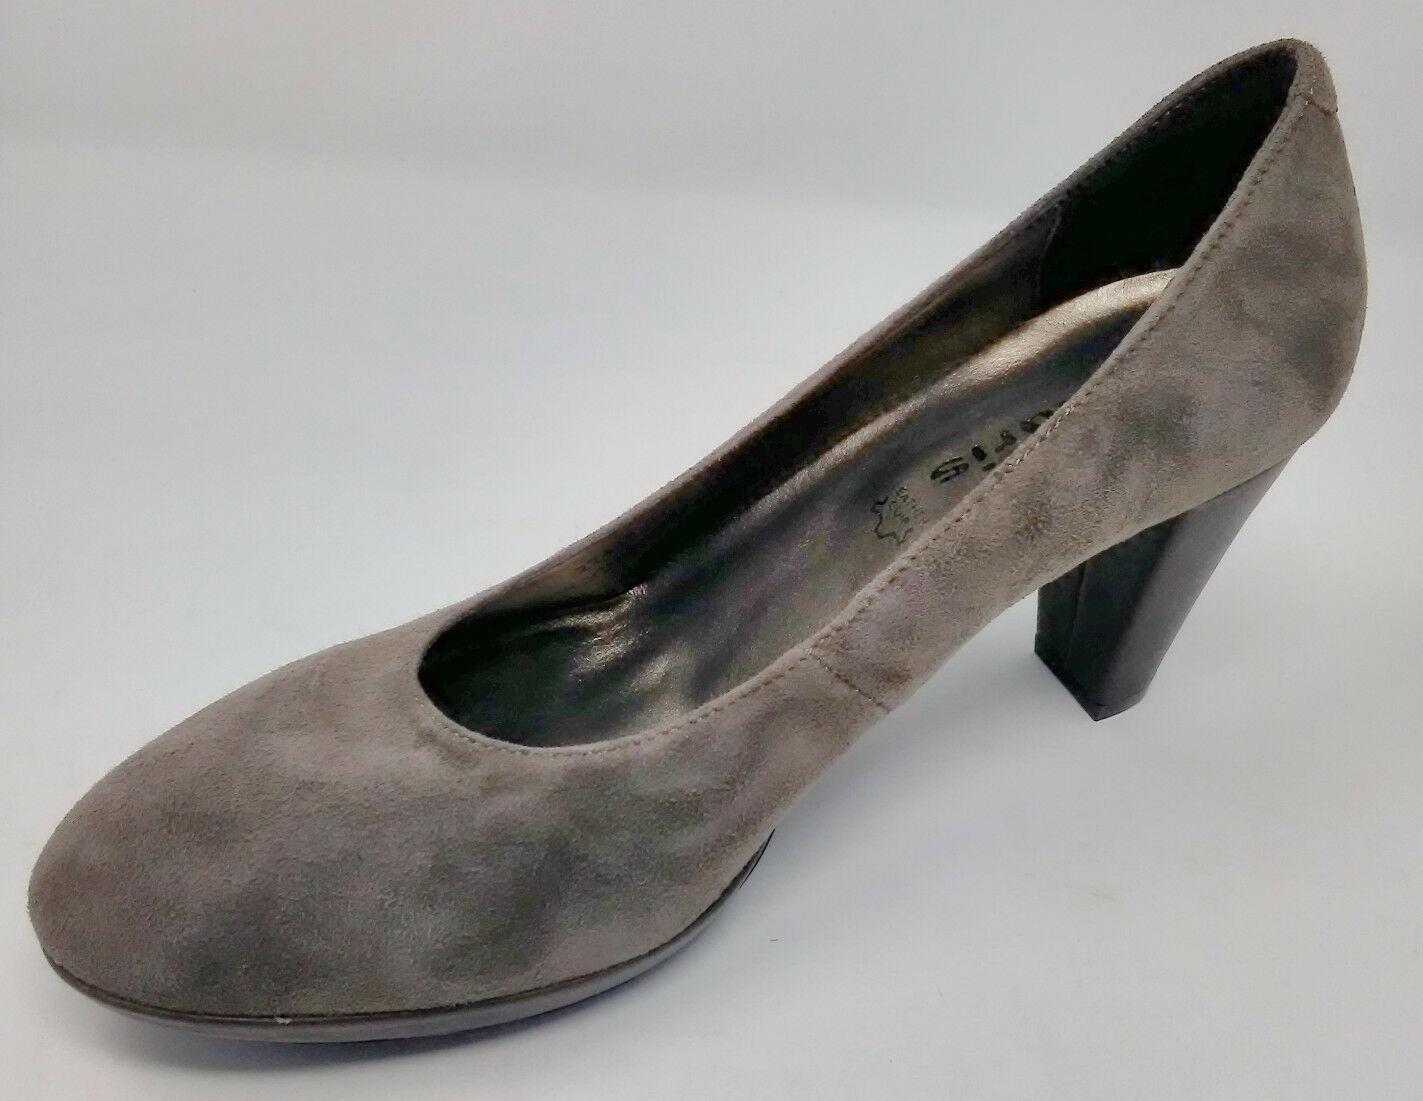 Tamaris Womens UK 6 Pepper GREY shoes Heels 1-22422-27 324 EU39 Suede Leather